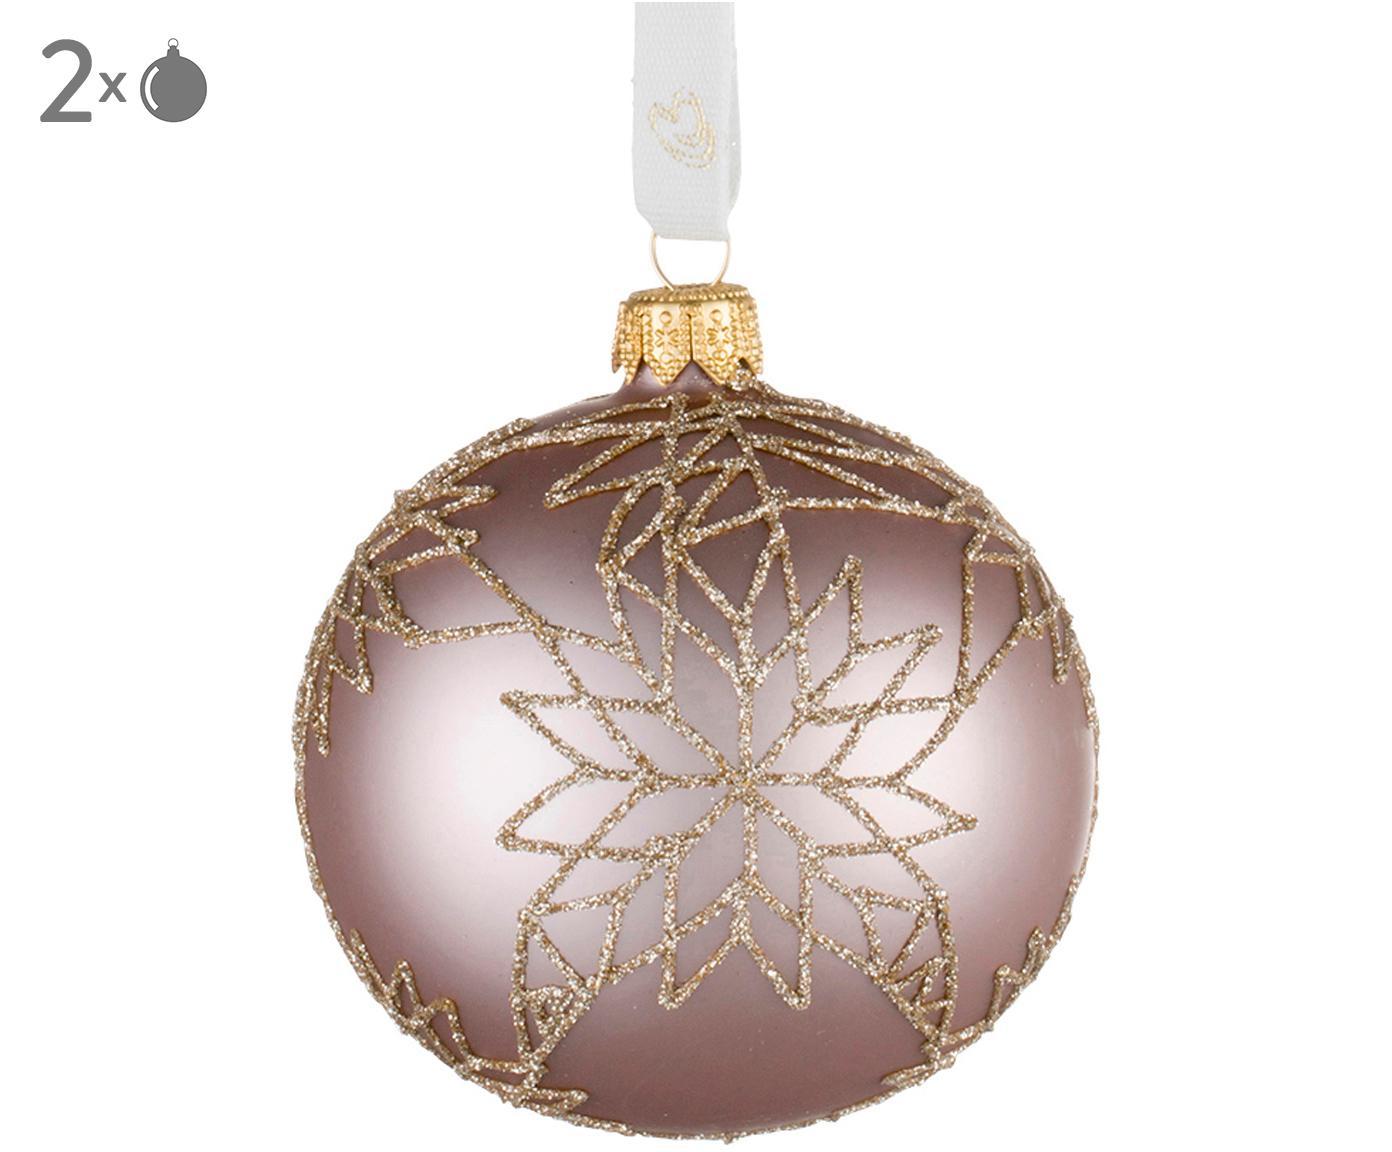 Weihnachtskugeln Cadelia, 2 Stück, Rosa, Goldfarben, Ø 8 x H 8 cm